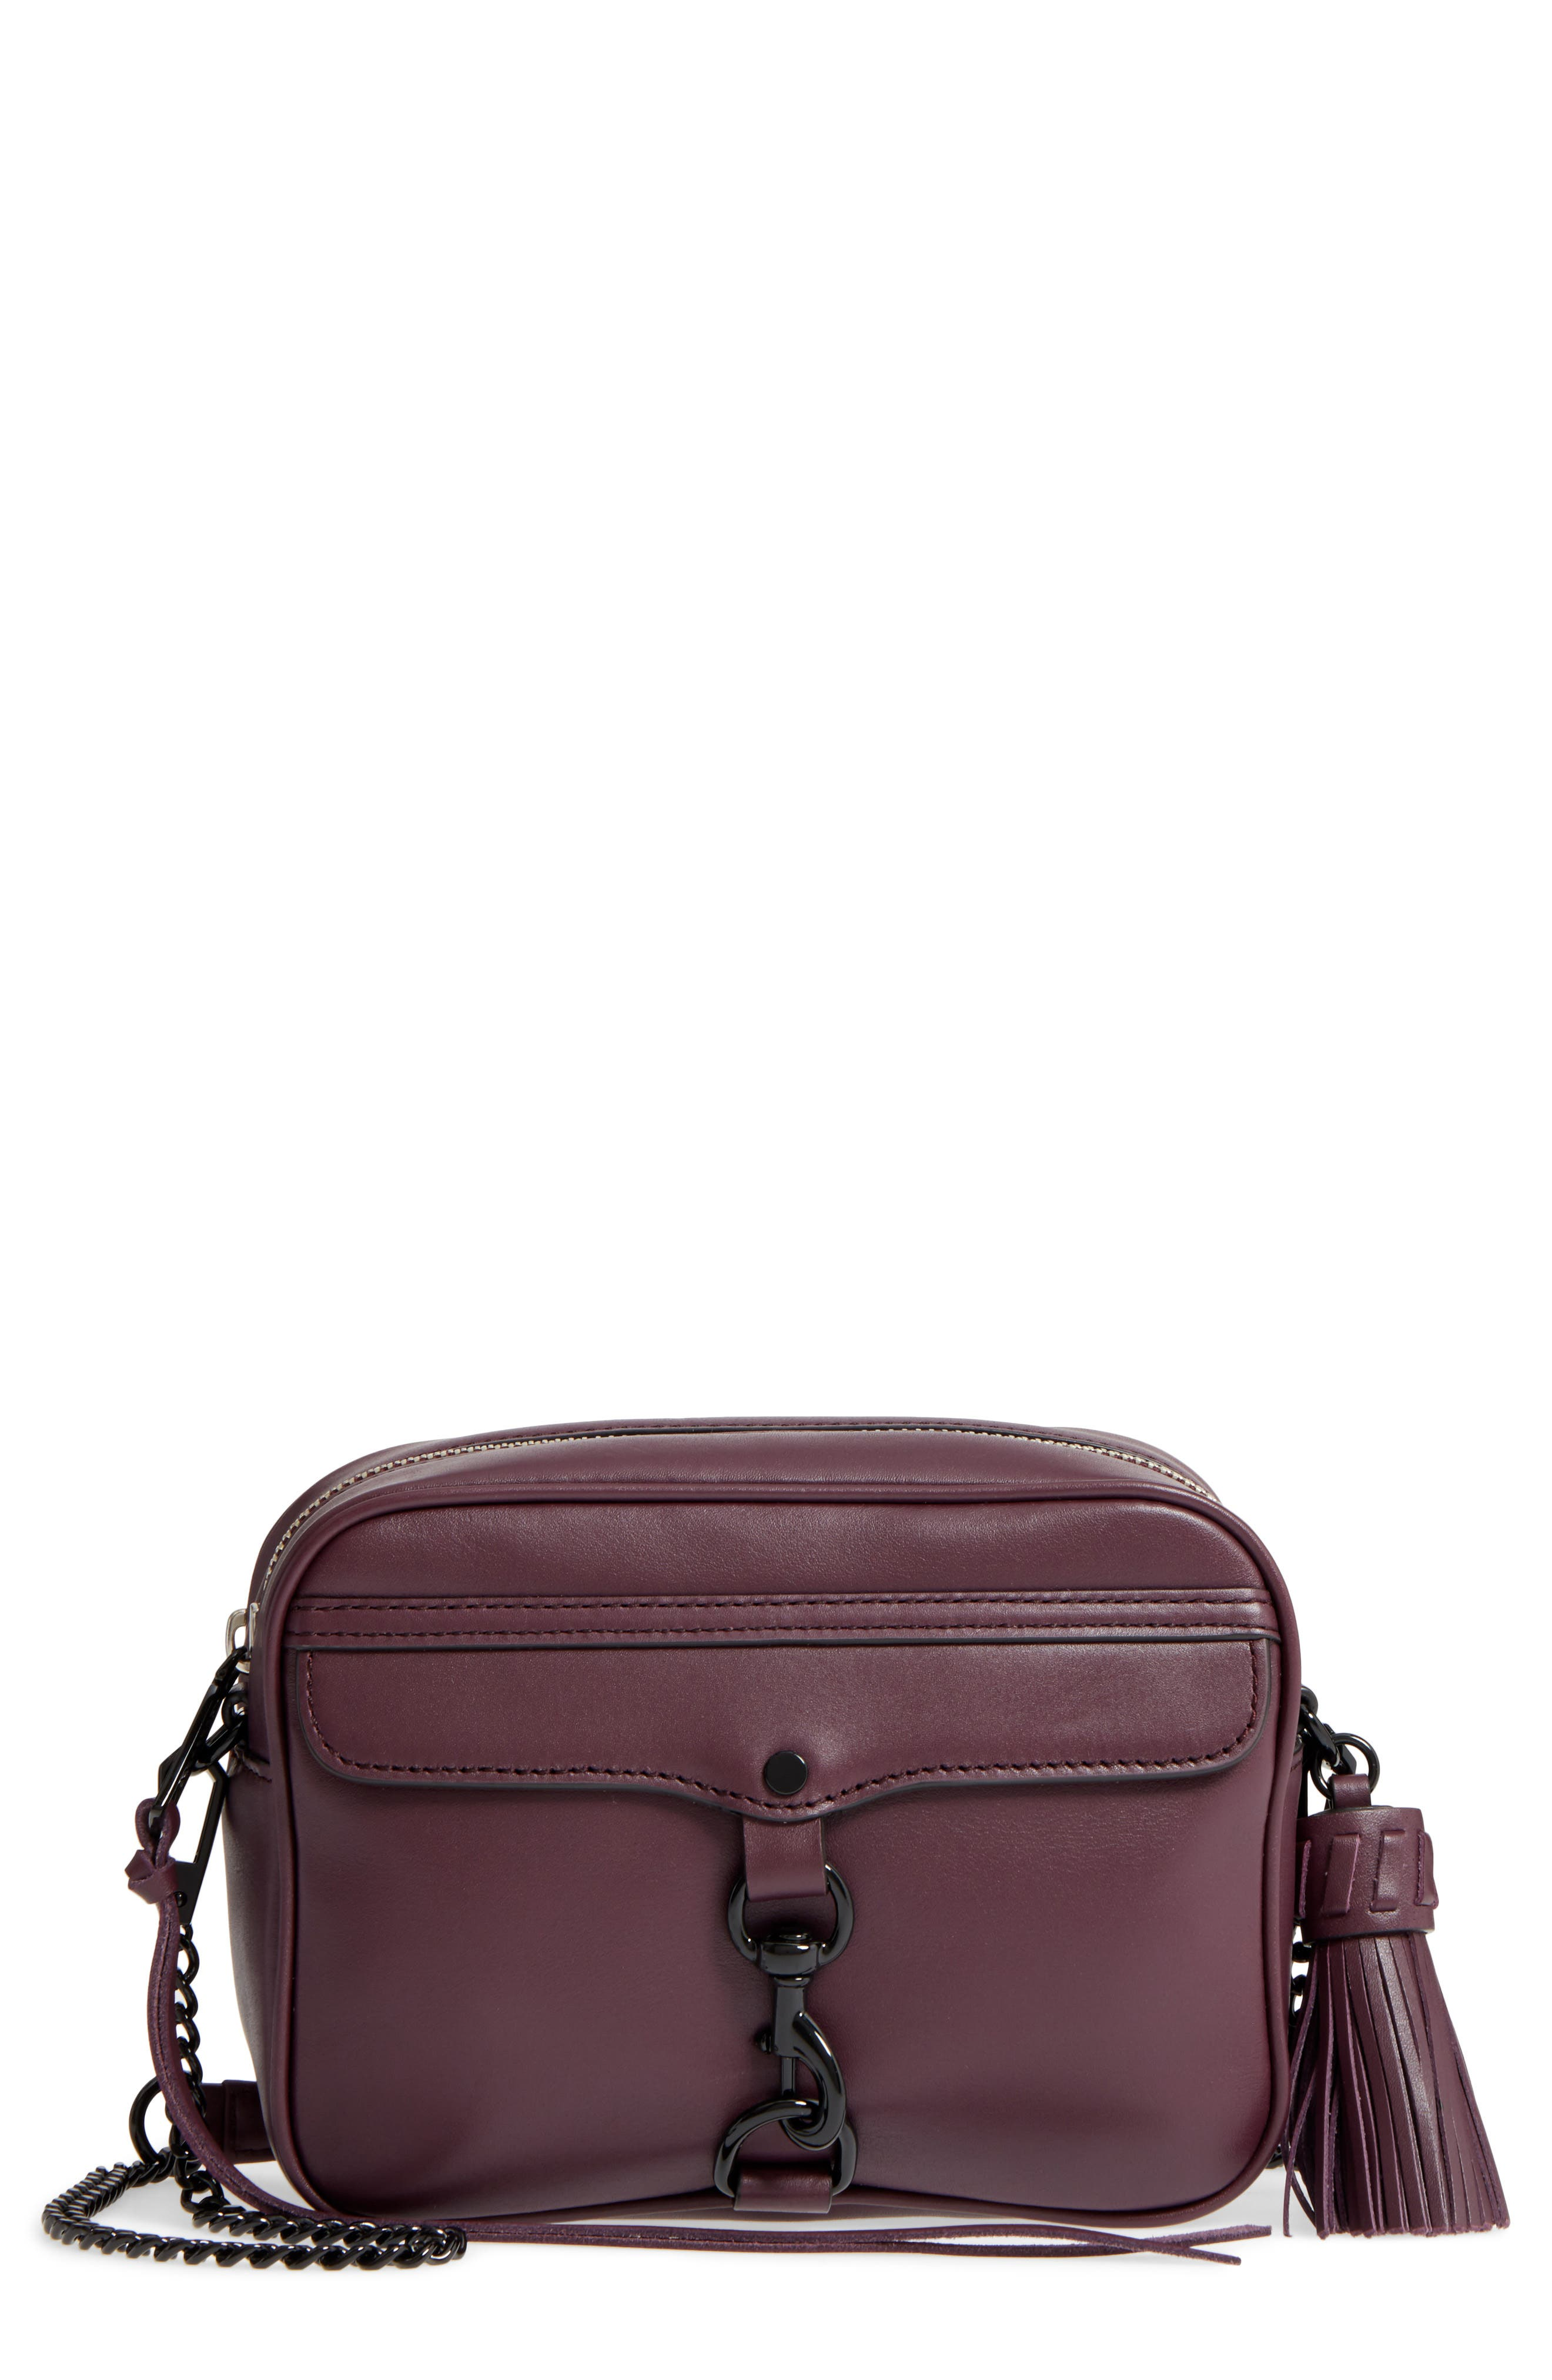 MAB Camera Bag,                         Main,                         color, Dark Cherry